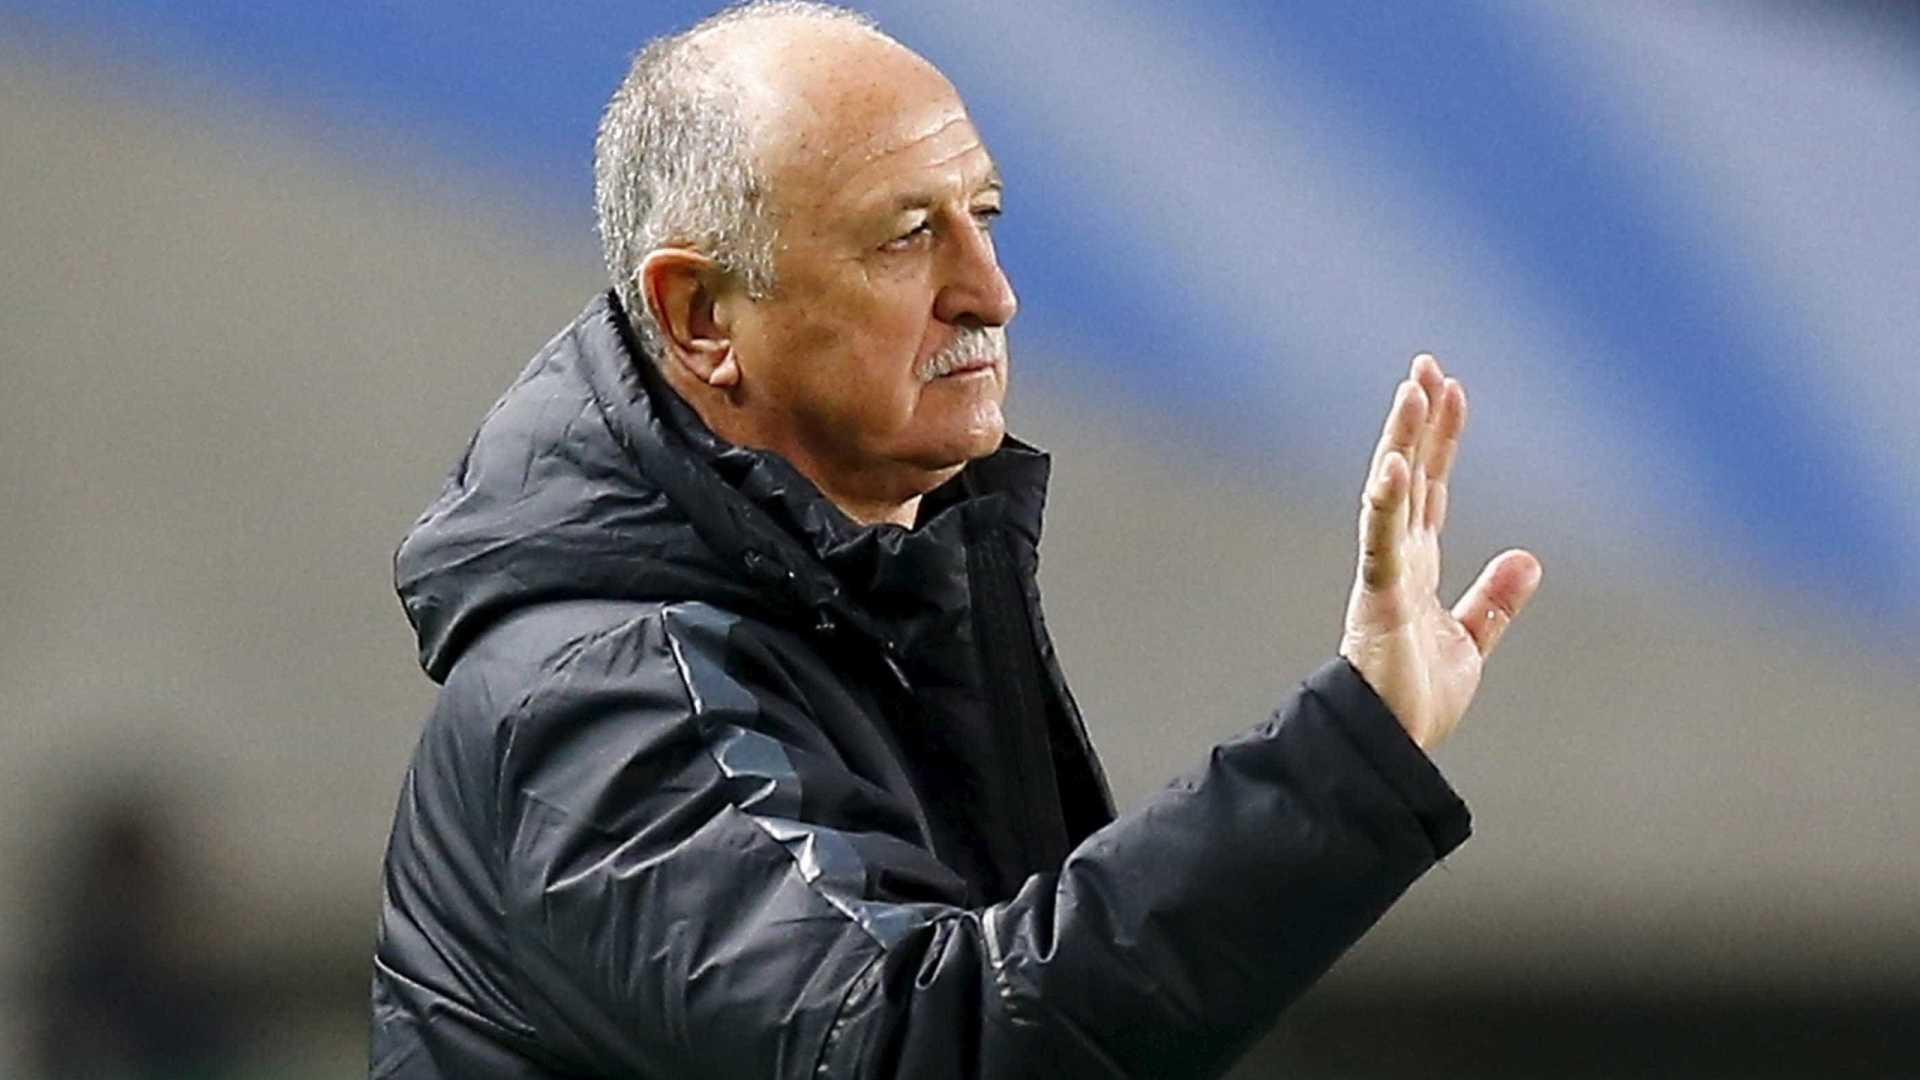 - Scolari - Luiz Felipe Scolari despedido do Palmeiras